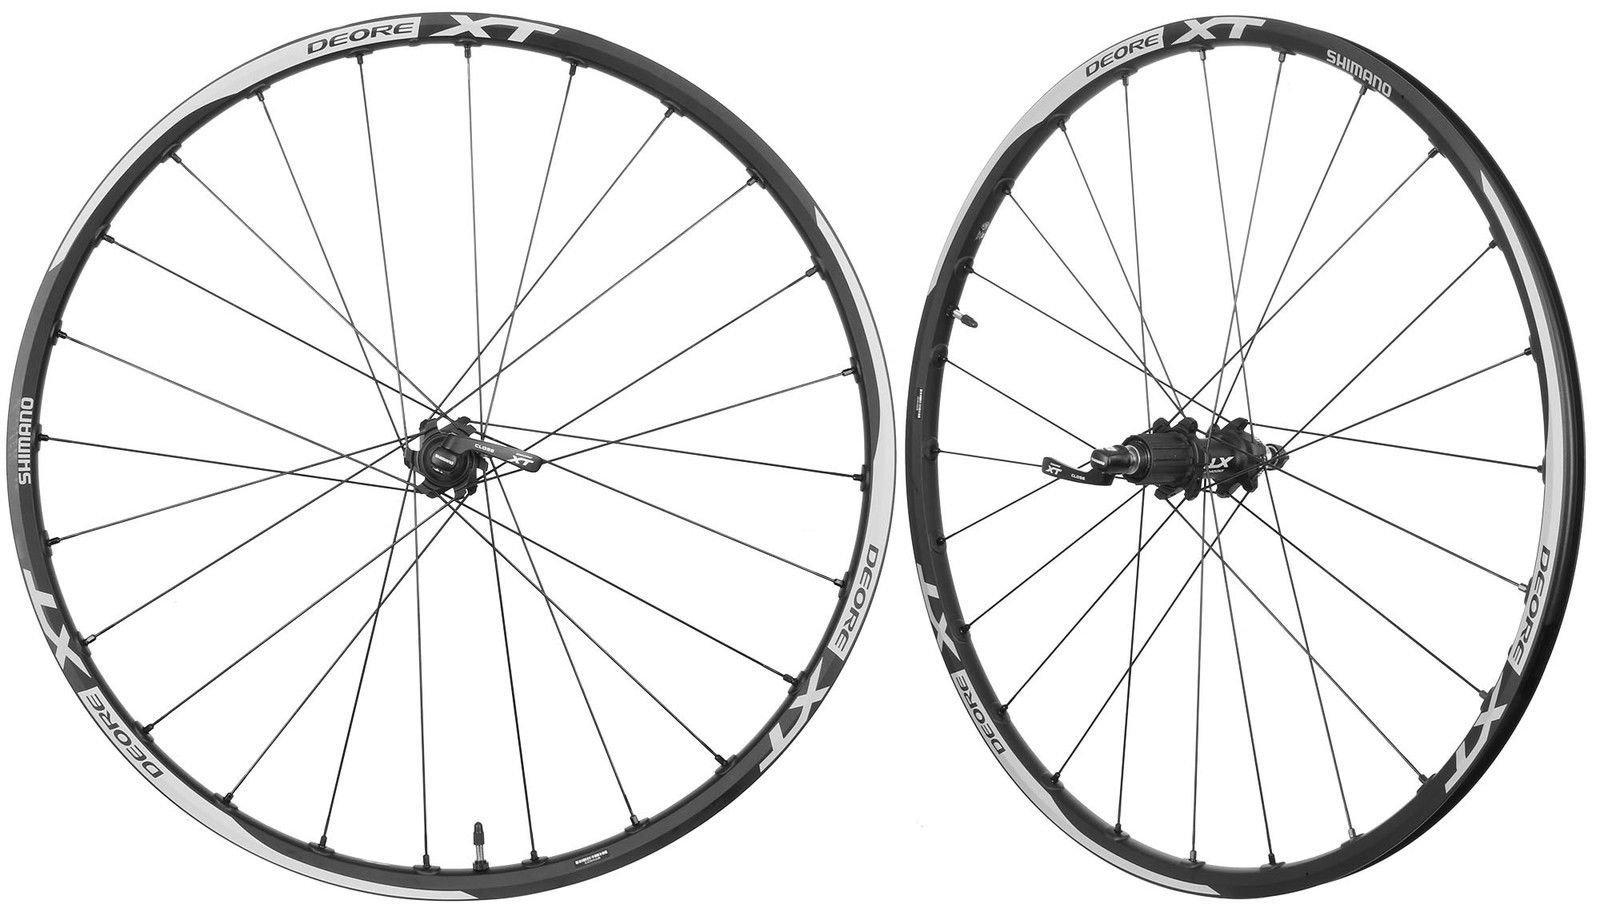 Shimano Deore XT M785 27.5'' Wheelset